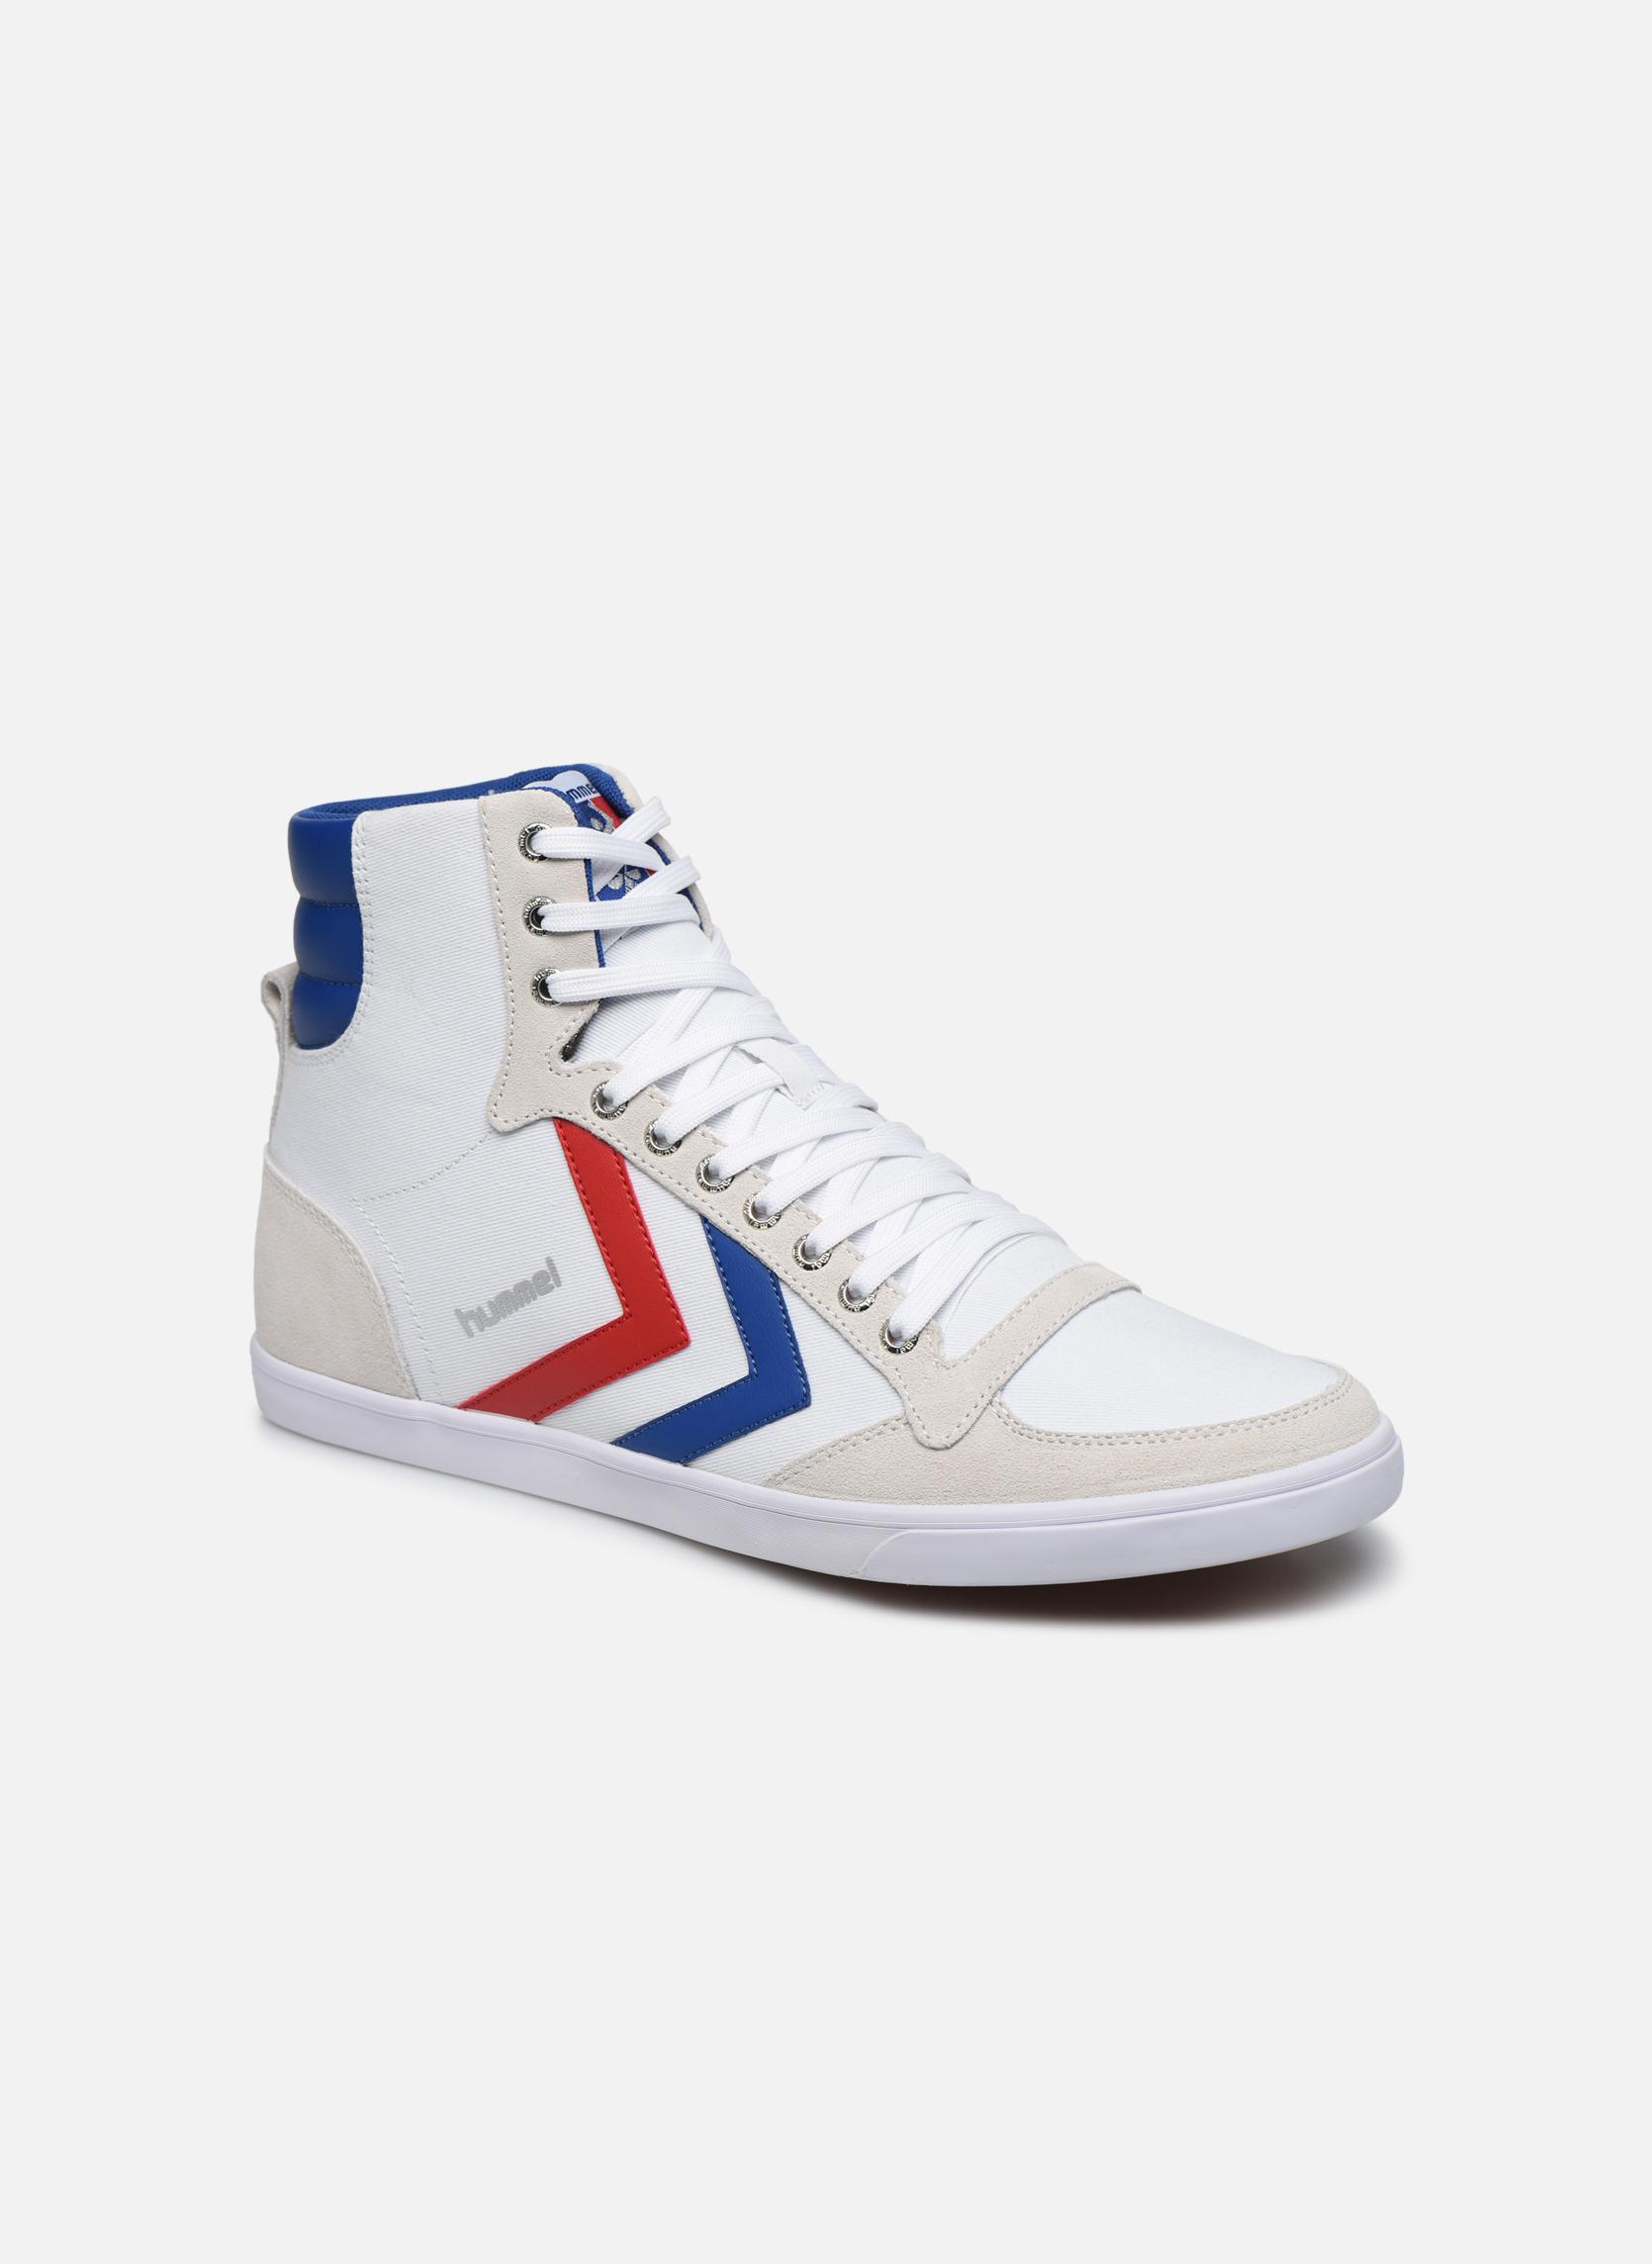 Sneakers Uomo Hummel Slimmer Stadil High canvas